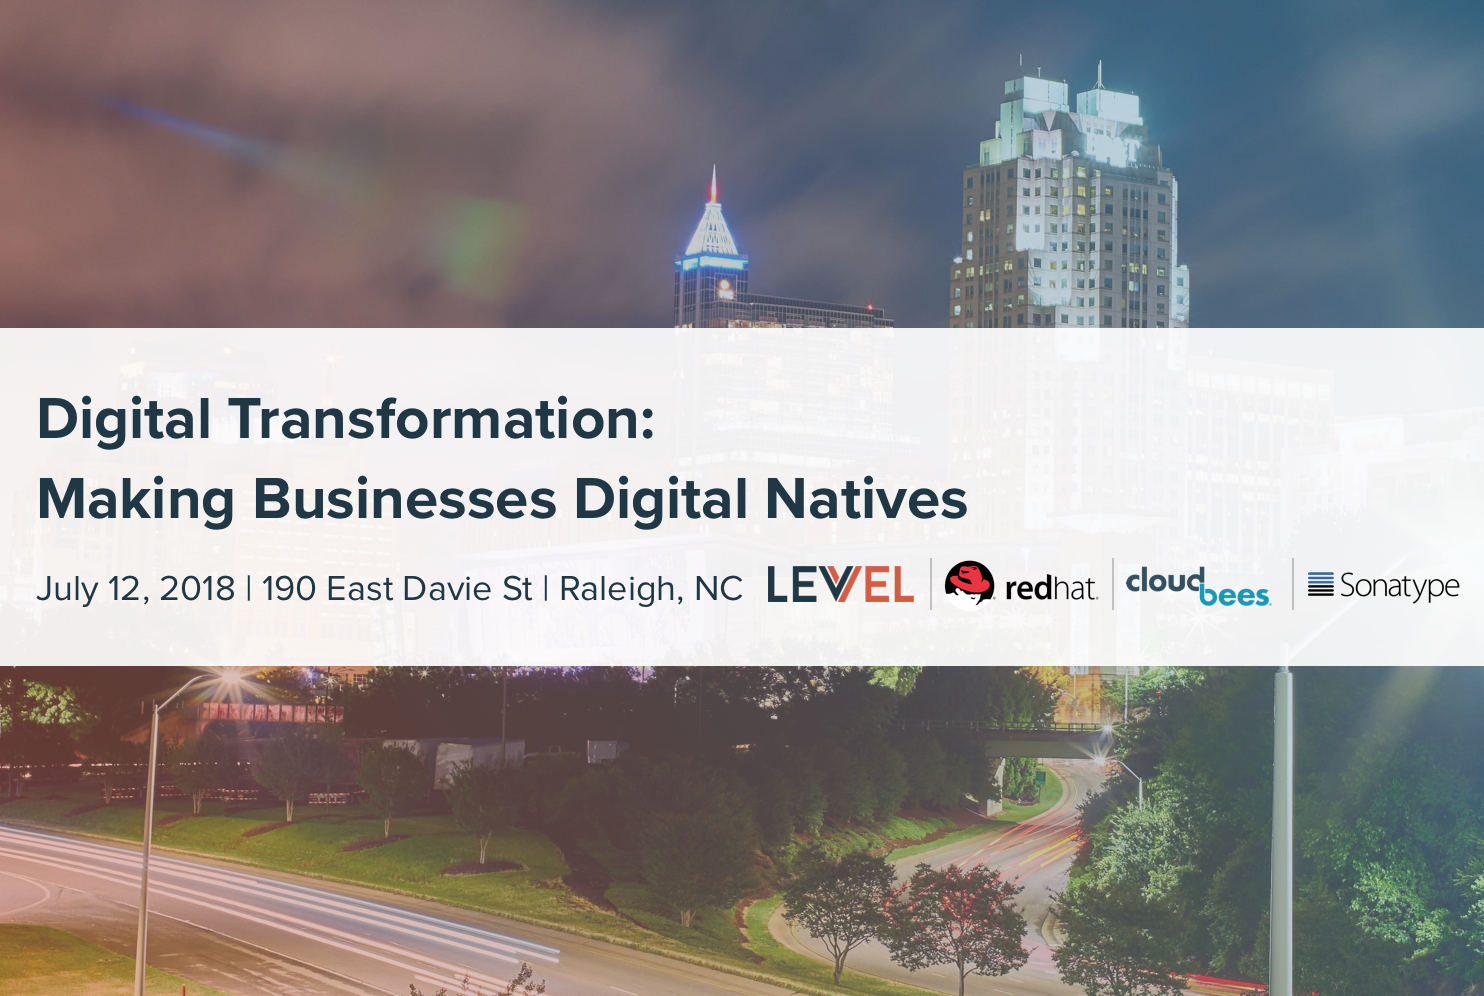 Digital Transformation: Making Businesses Digital Natives